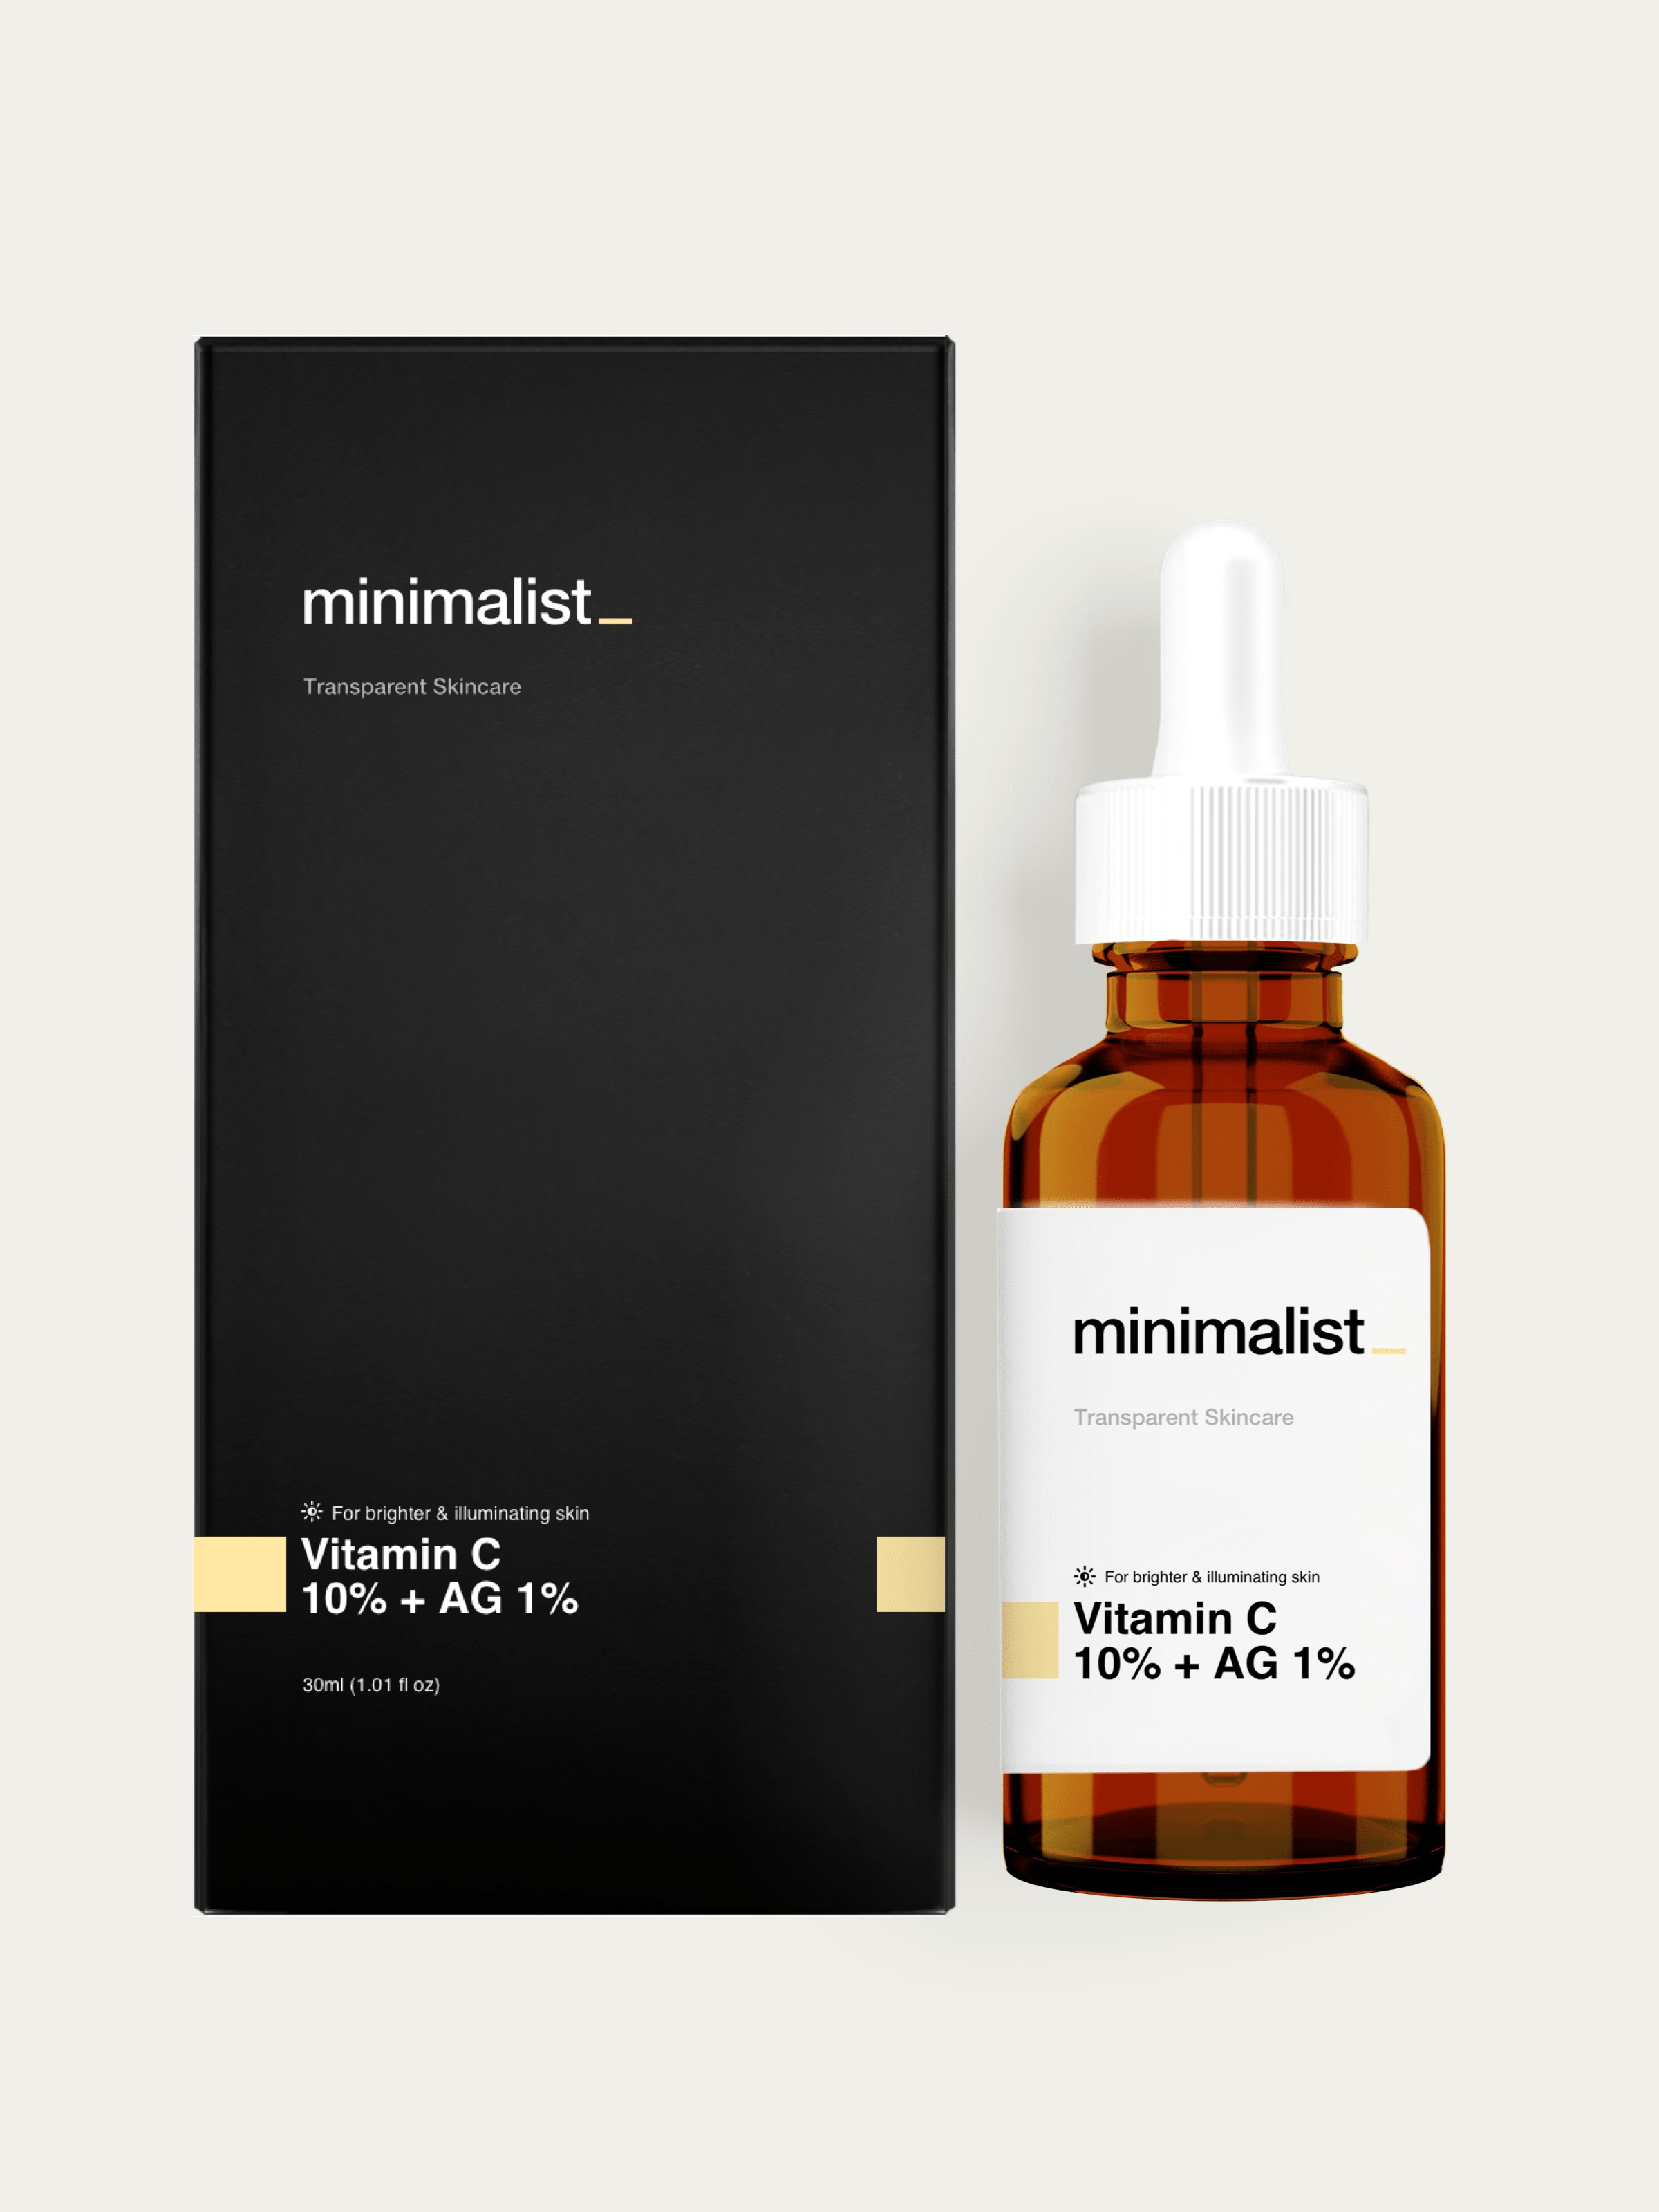 Be Minimalist Vitamin C (Ethyl Ascorbic Acid) 10% + Acetyl Glucosamine 1%